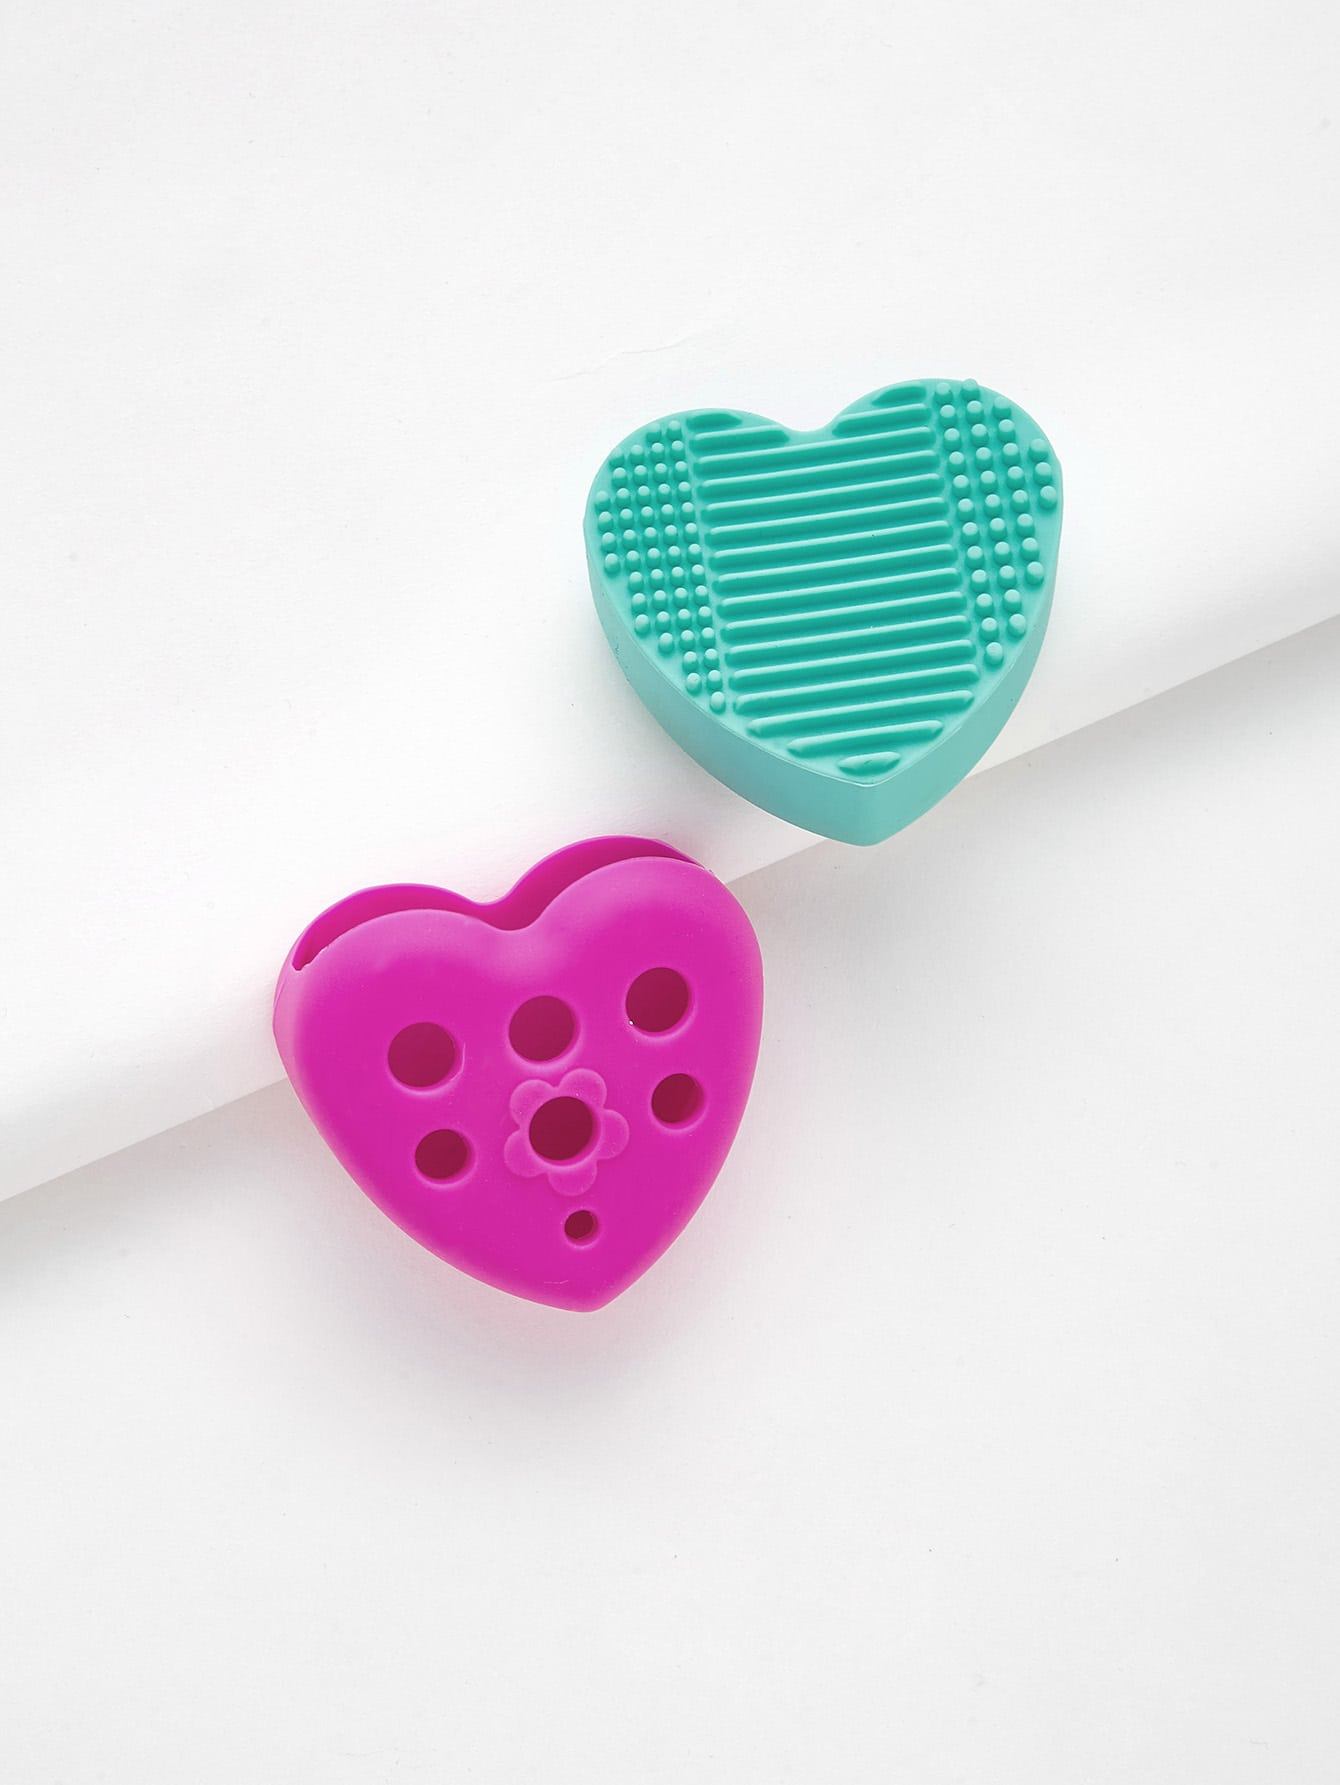 Heart Shaped Makeup Brush Cleaner 2pcs apple shaped makeup brush cleaner 2pcs